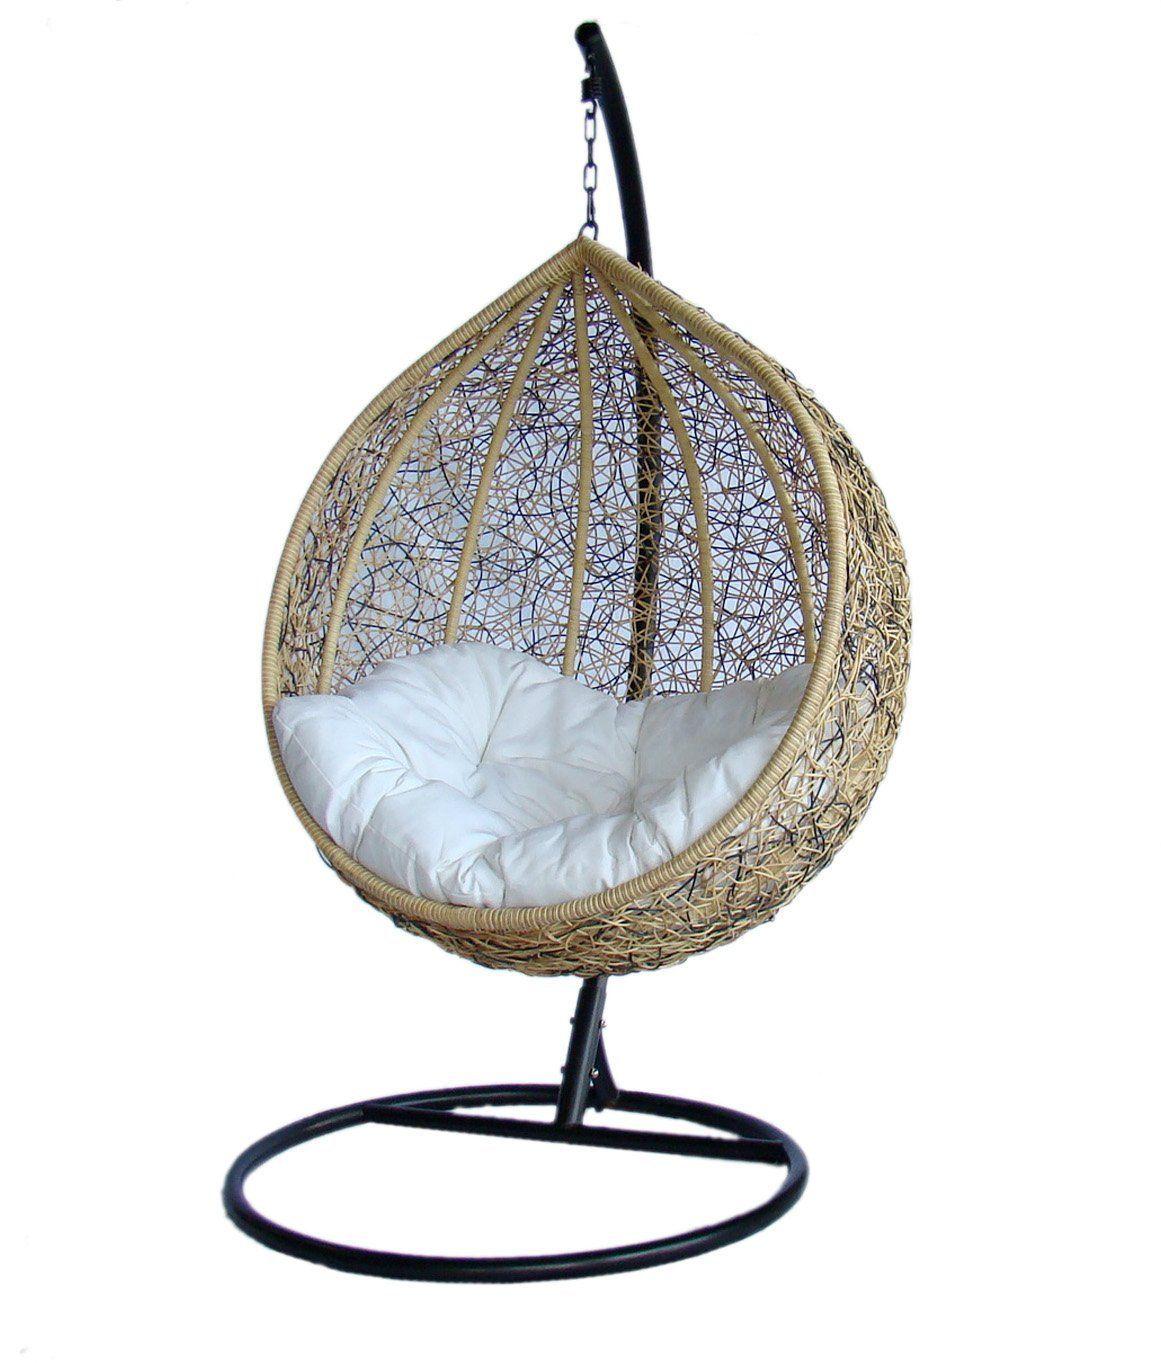 Amazon Com Trully Outdoor Wicker Swing Chair The Great Hammocks K003ab Patio Lawn Garden Swinging Chair Bedroom Hanging Chair Basket Chair